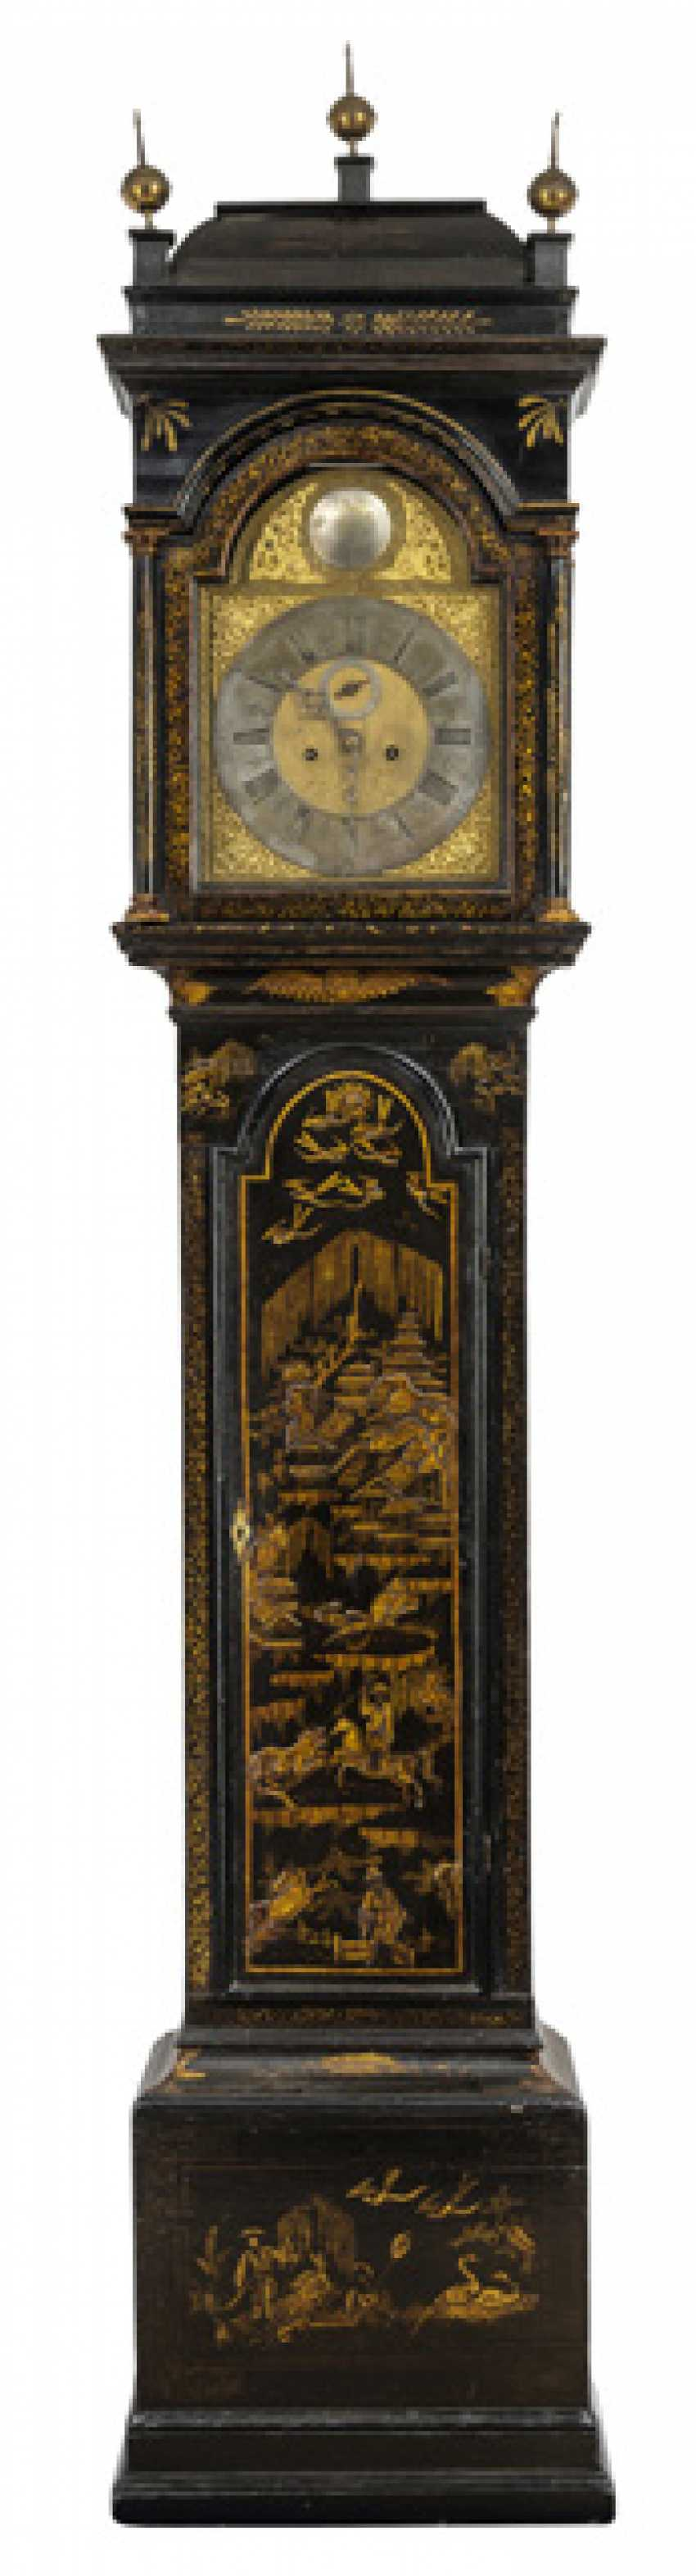 Floor grandfather clock. Chinoiser style, England, around 1800 - photo 1